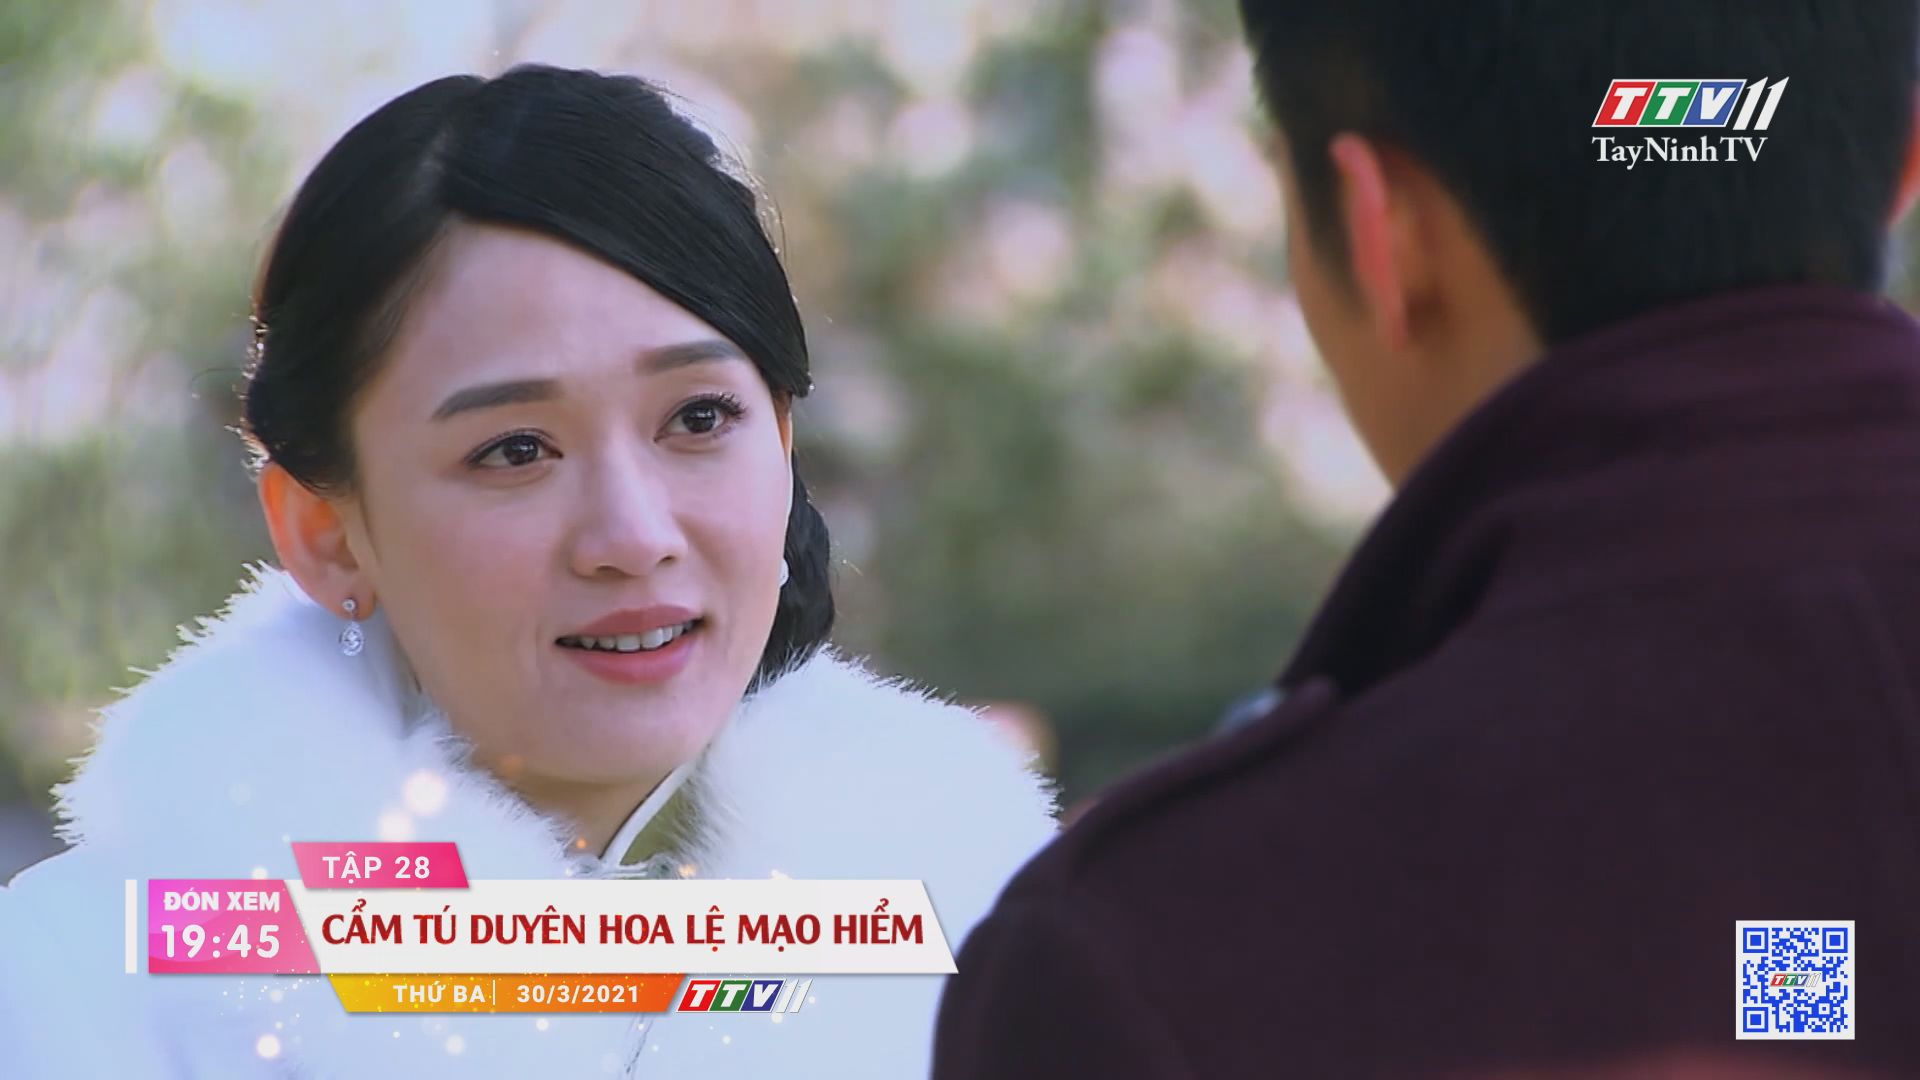 Cẩm Tú duyên hoa lệ mạo hiểm-Trailer tập 28 | PHIM CẨM TÚ DUYÊN HOA LỆ MẠO HIỂM | TayNinhTVE